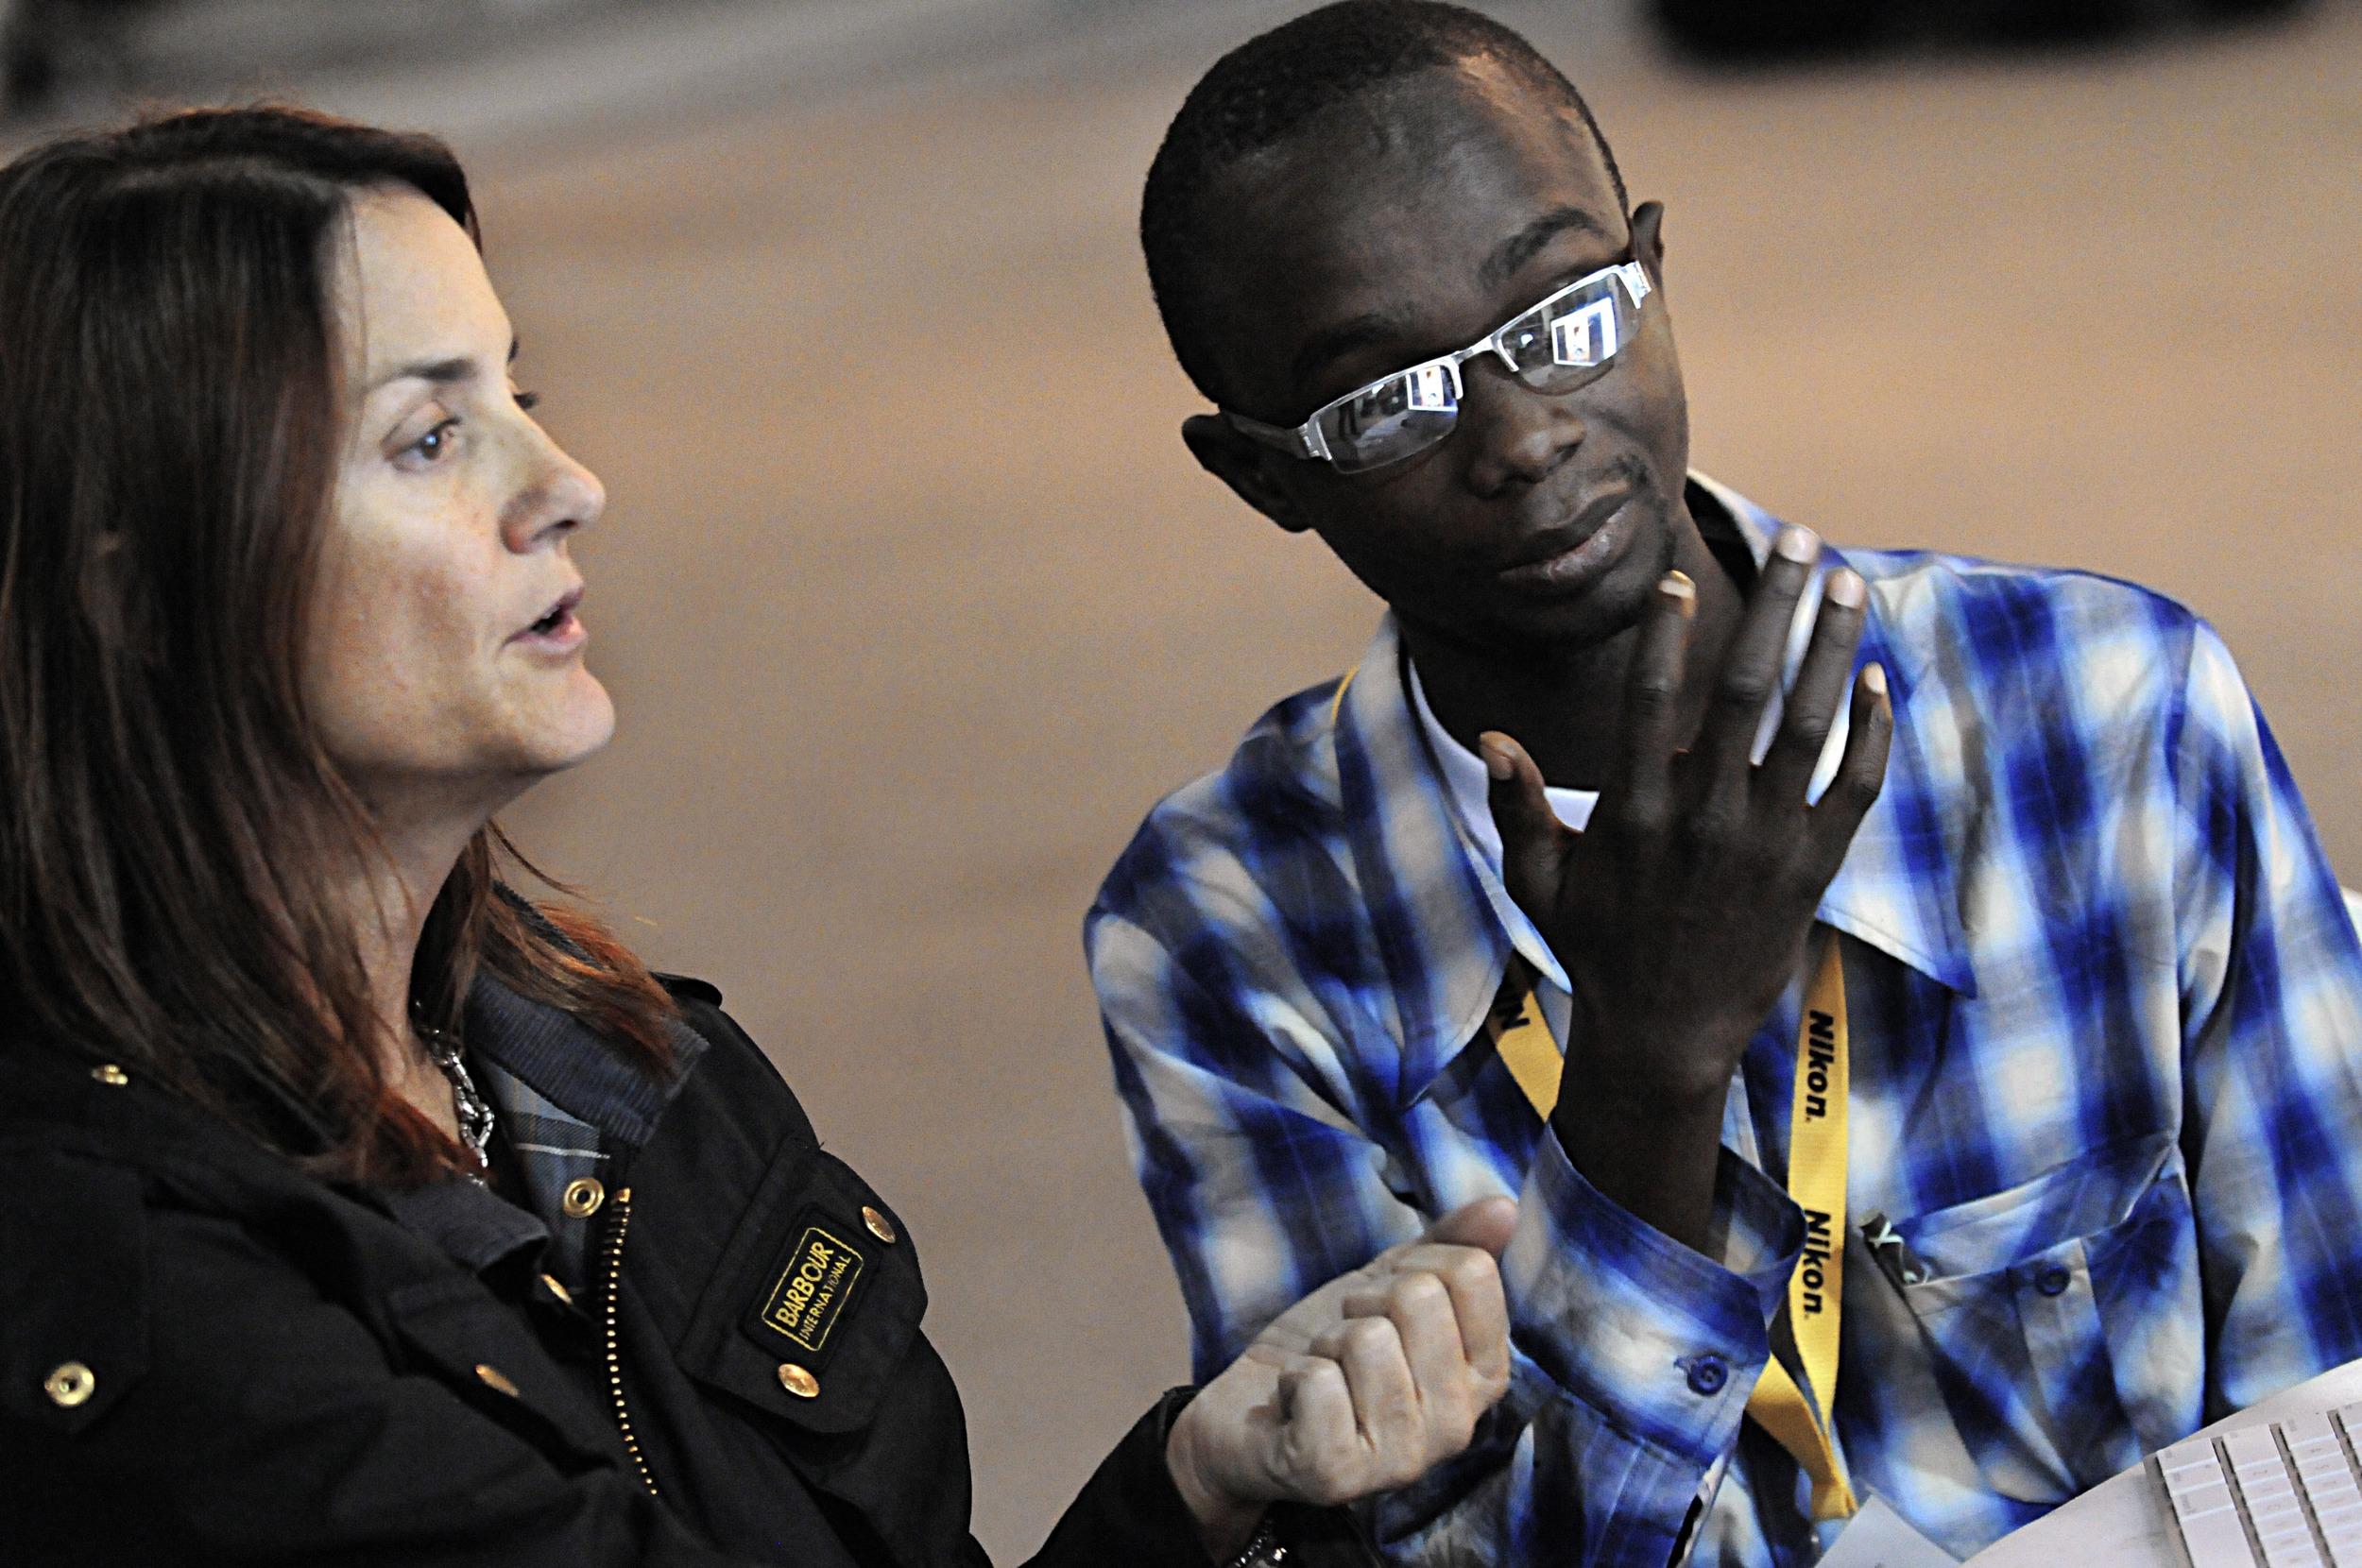 Liberian investigative journalist Nat Bayjay